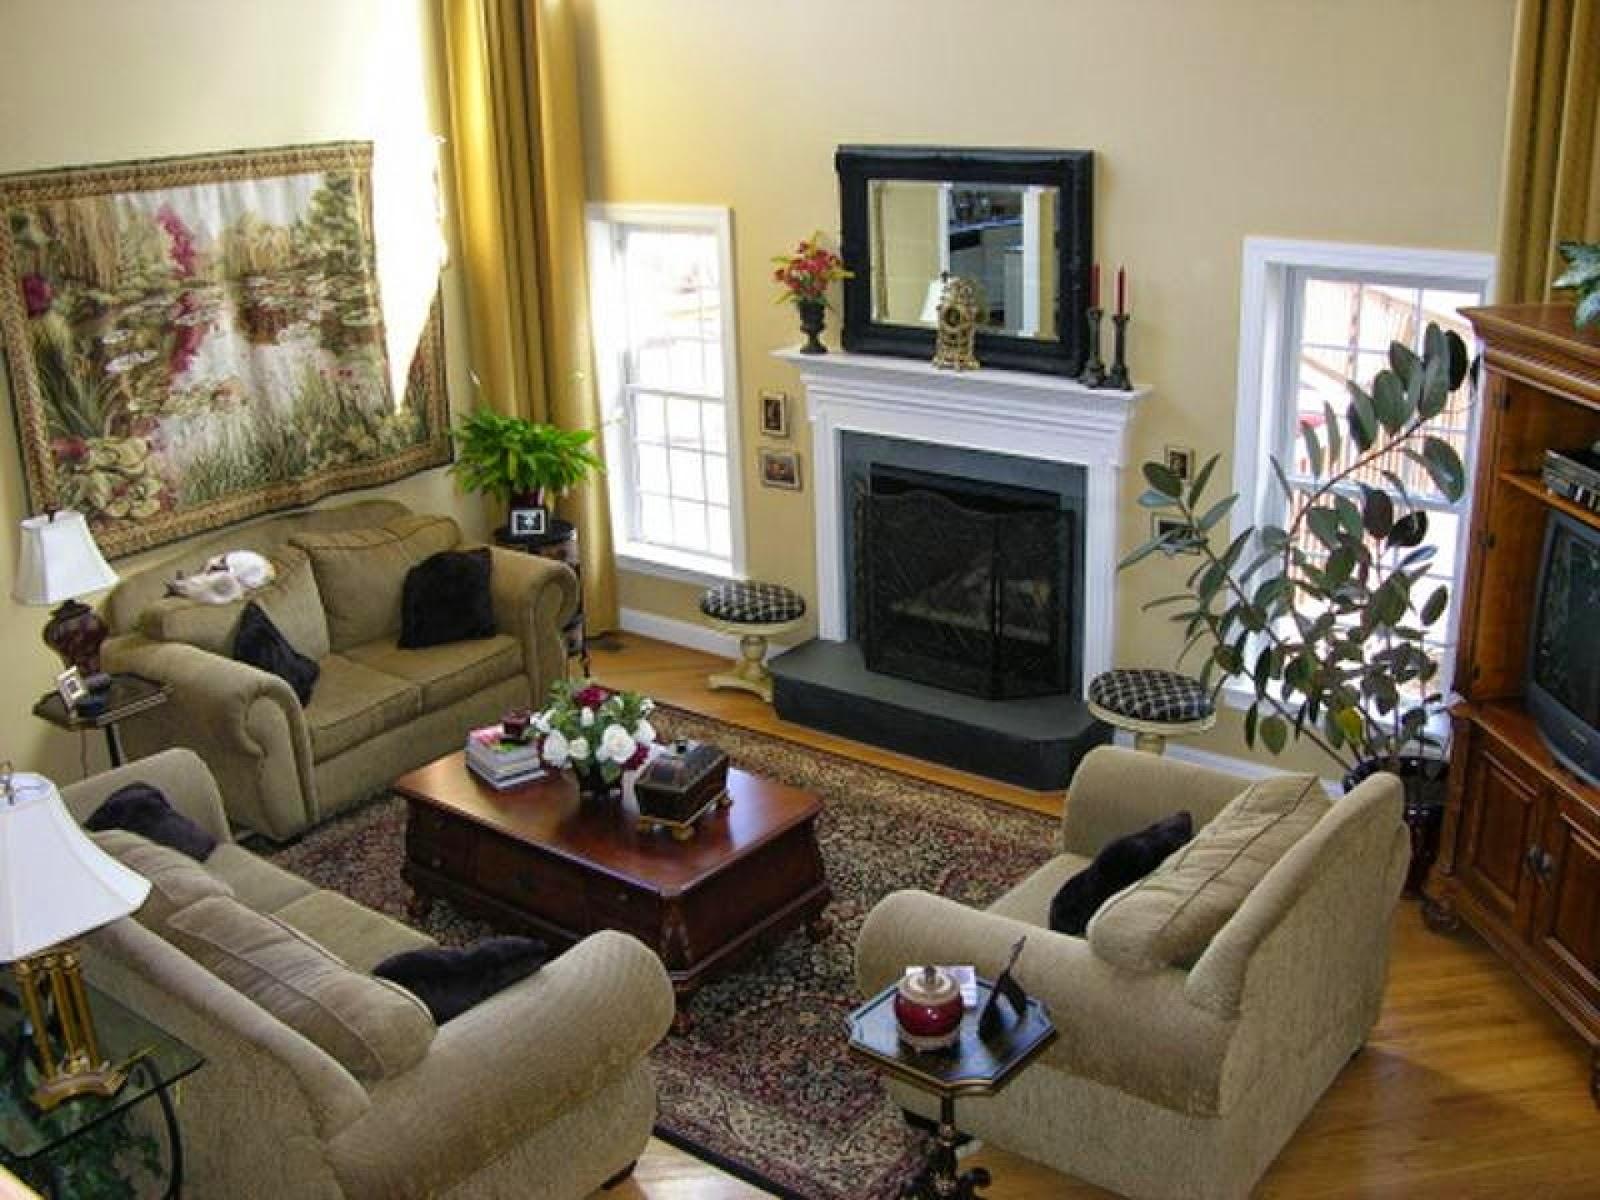 Home Design Ideas And Inspiration Onlycily Blogspot Com